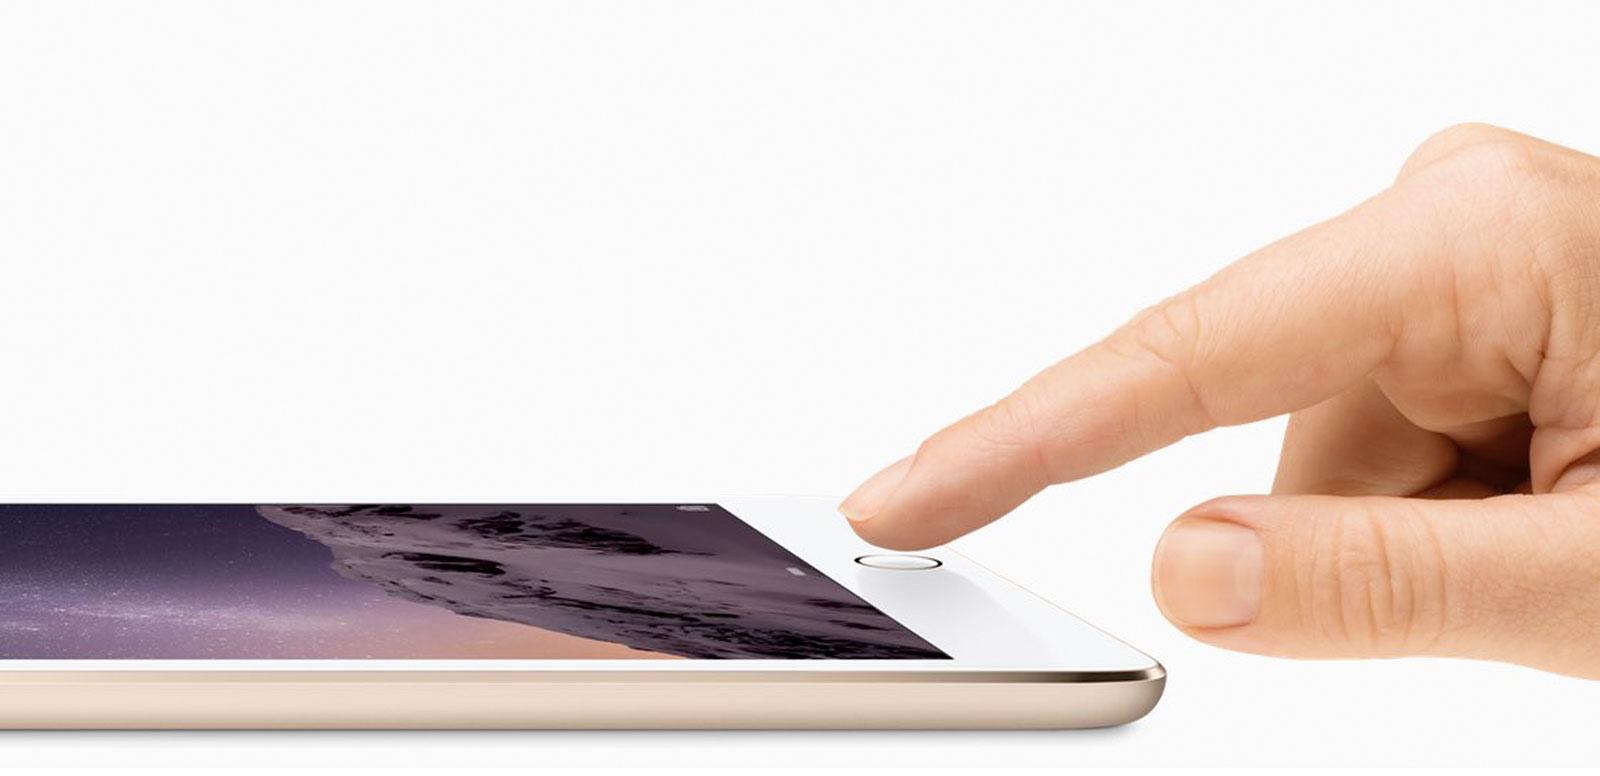 how to change apple id password on ipad air 2